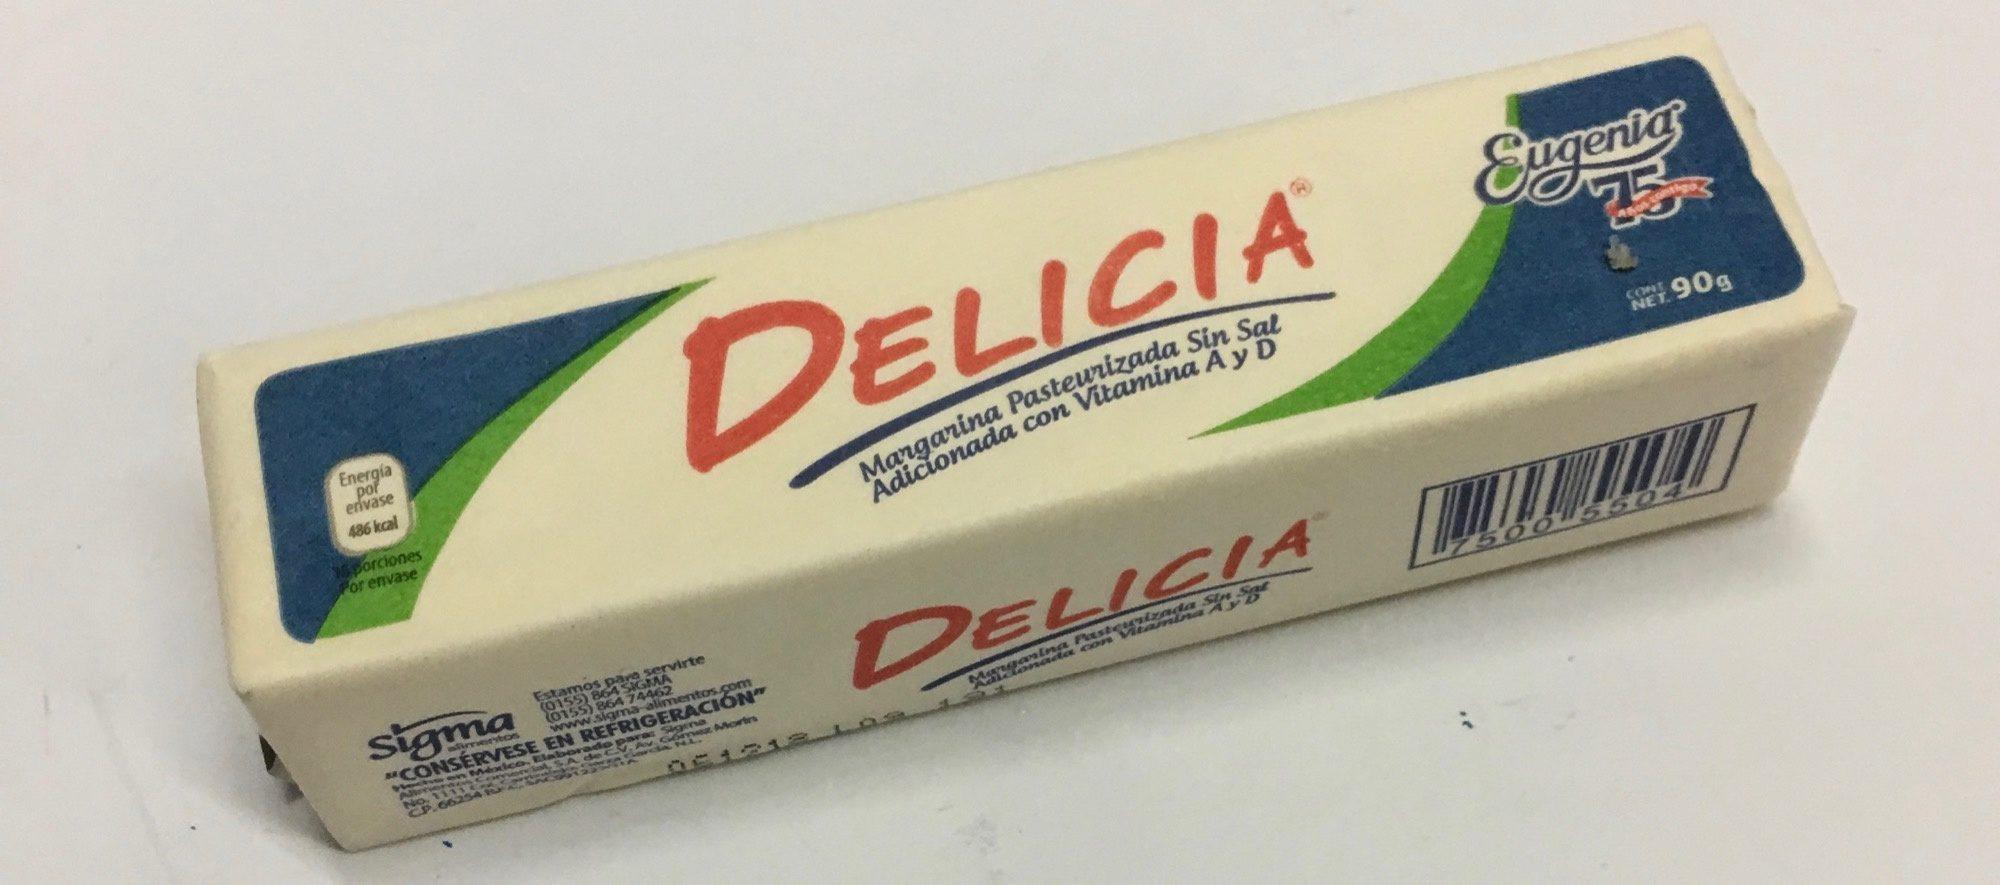 Margarina sin sal Delicia Eugenia - Product - es